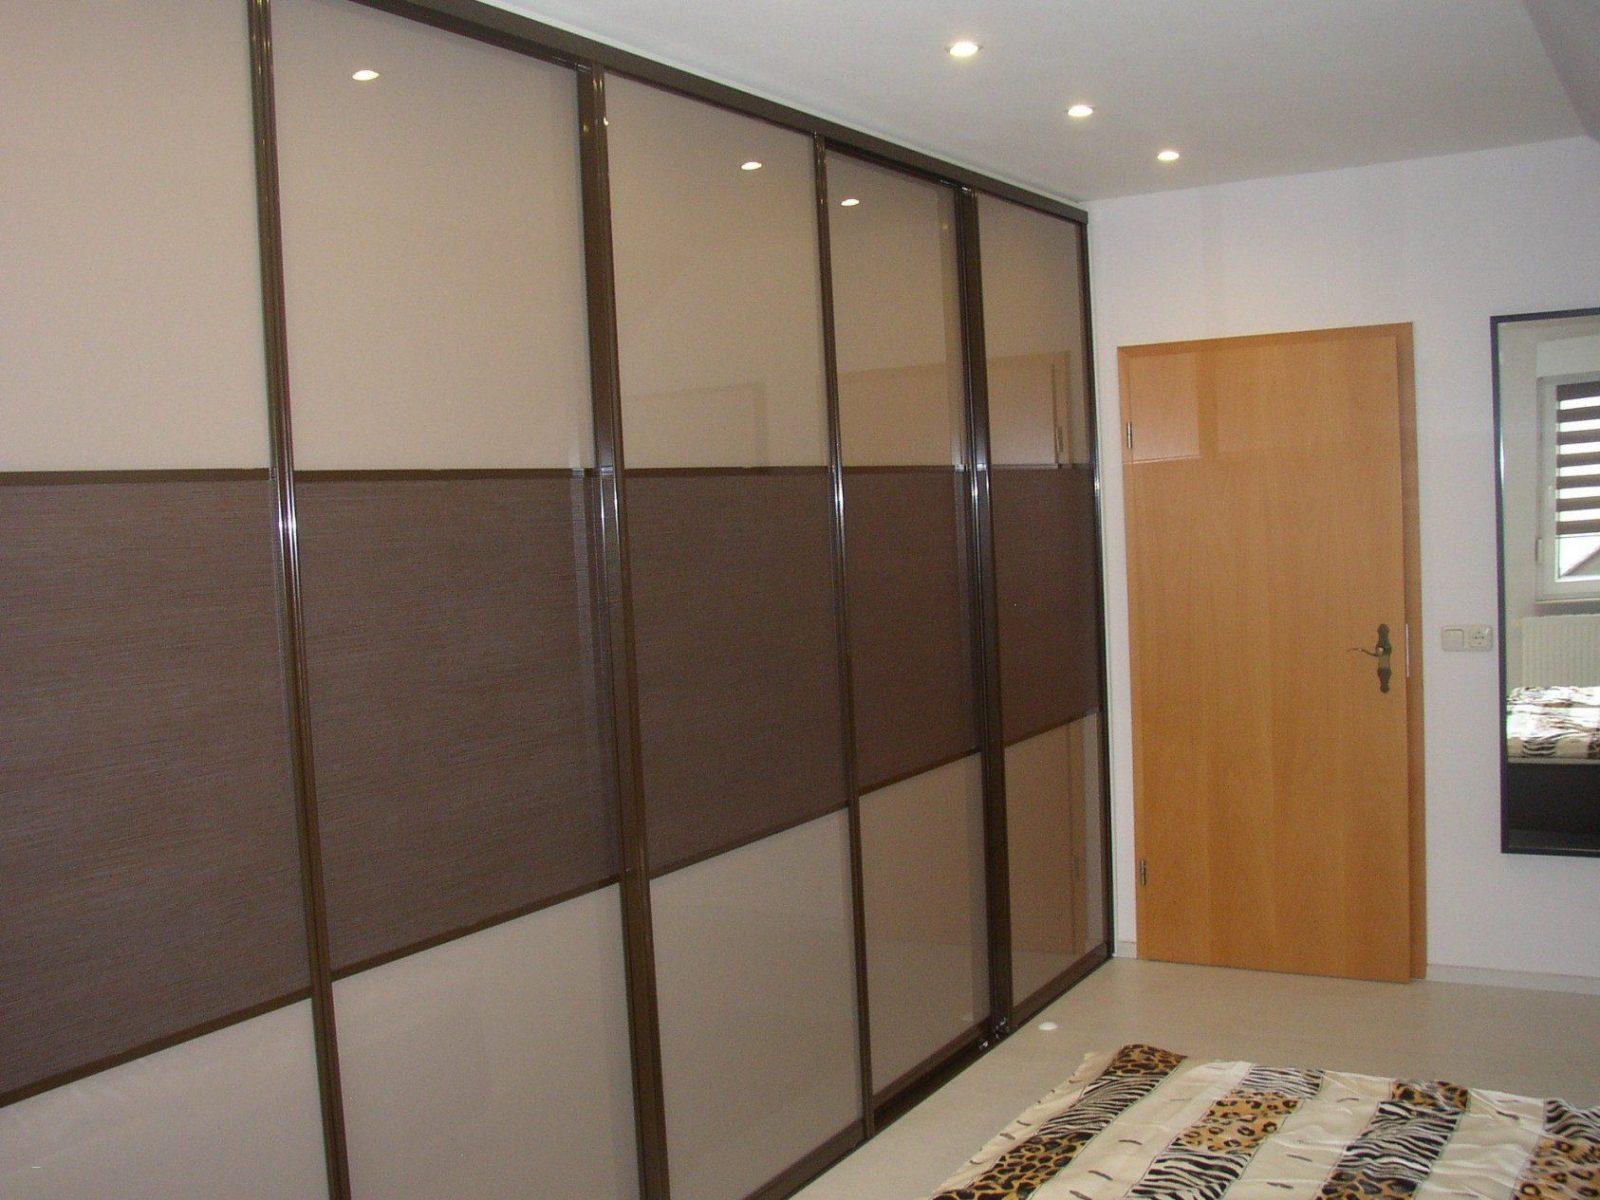 Wandschrank Selber Bauen Schiebetüren Erstaunlich Schrank Selber von Wandschrank Selber Bauen Schiebetüren Bild